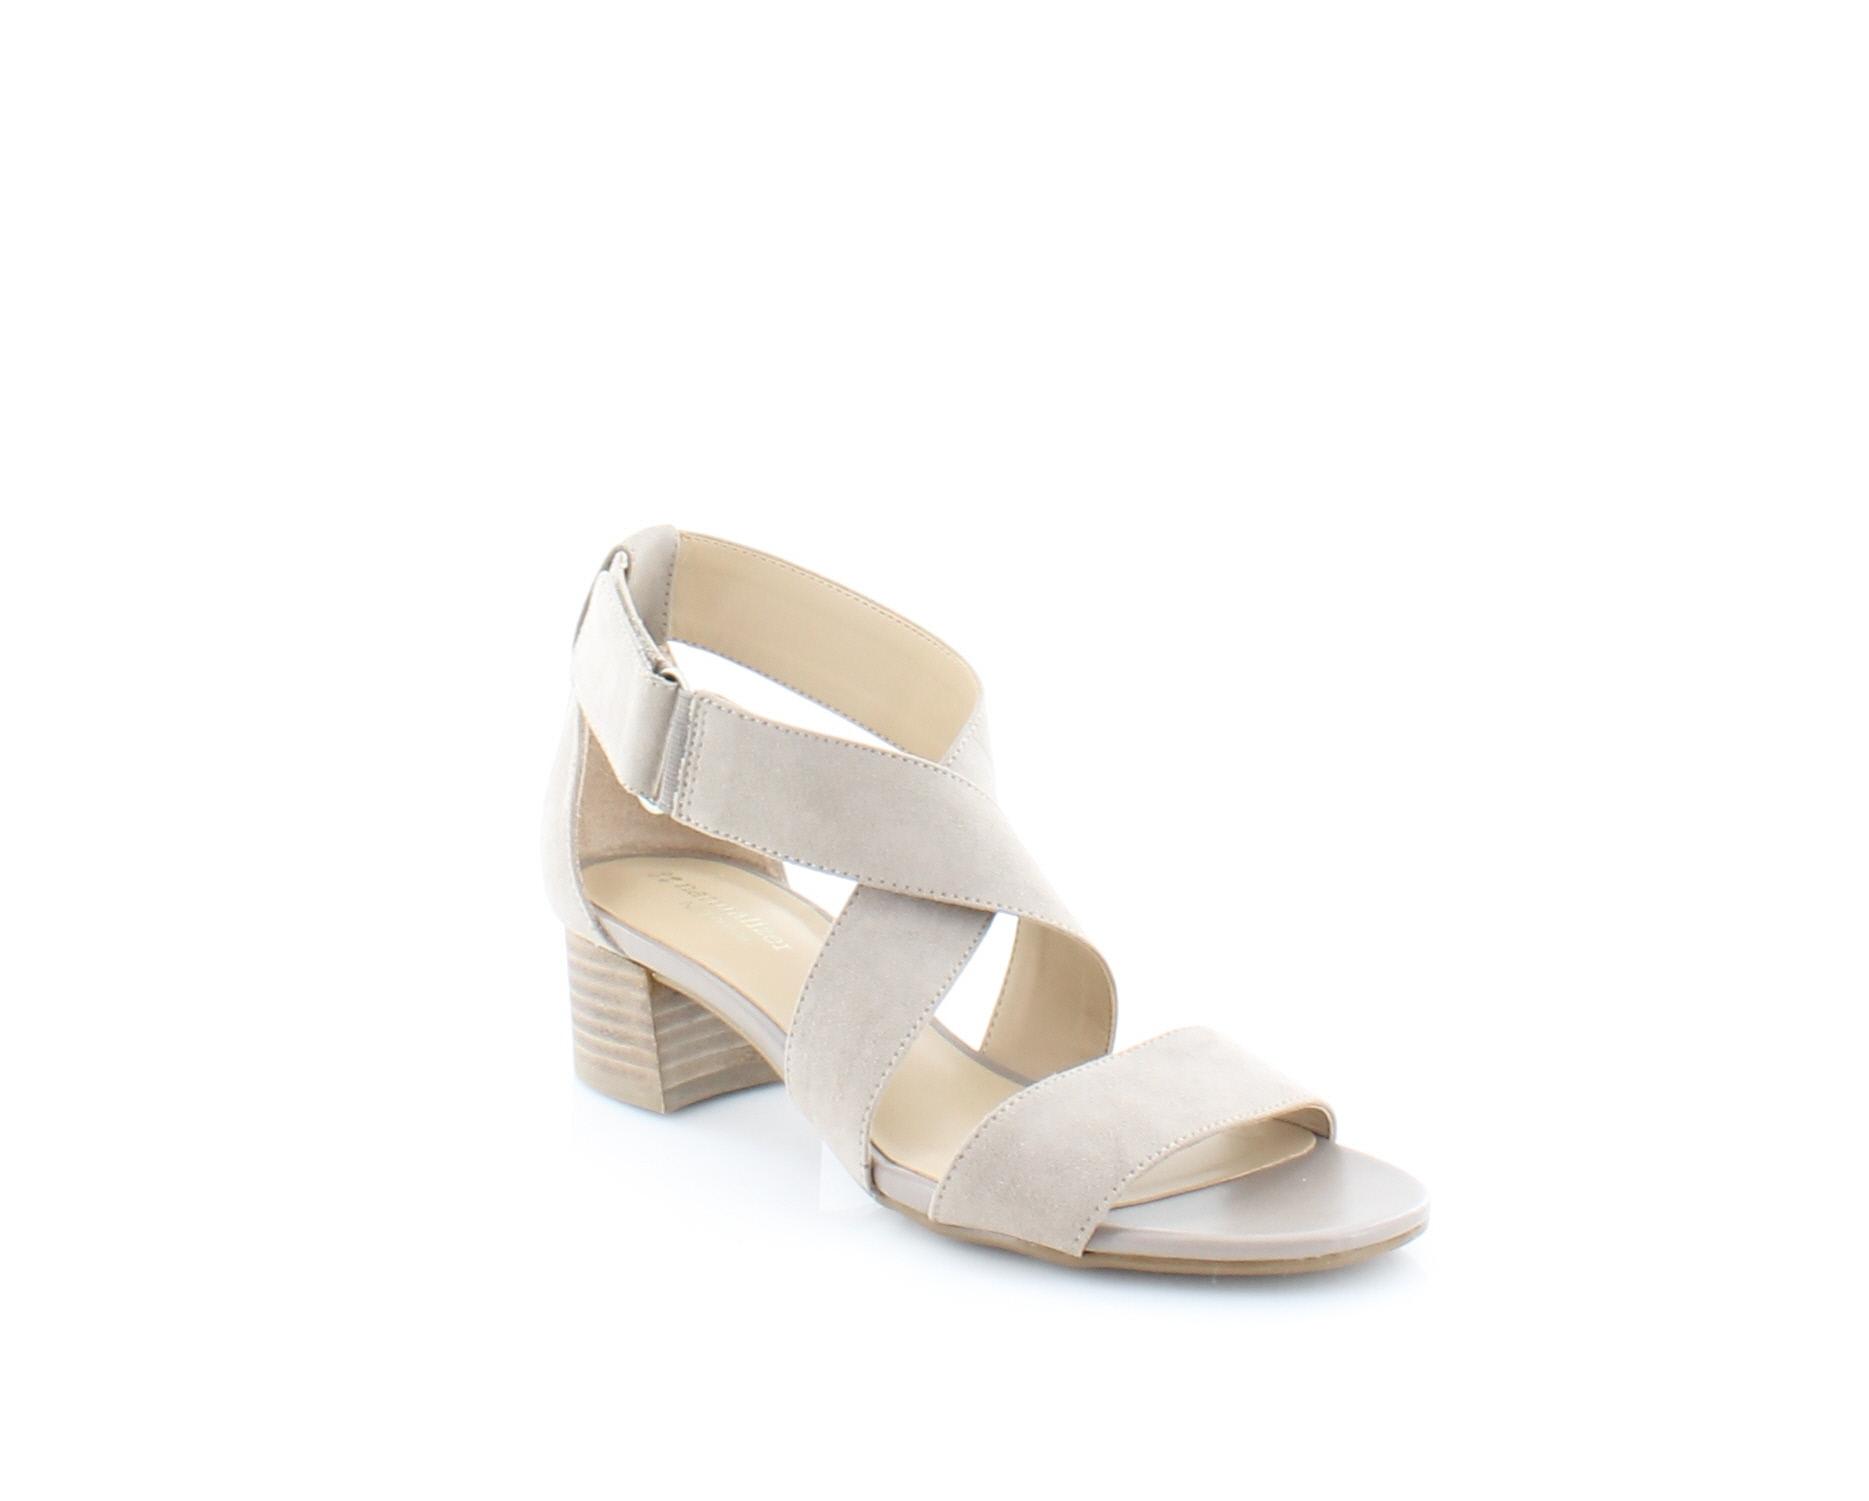 744fa921d60 Naturalizer Adele Beige Womens Shoes Size 5.5 M Sandals MSRP  69 ...